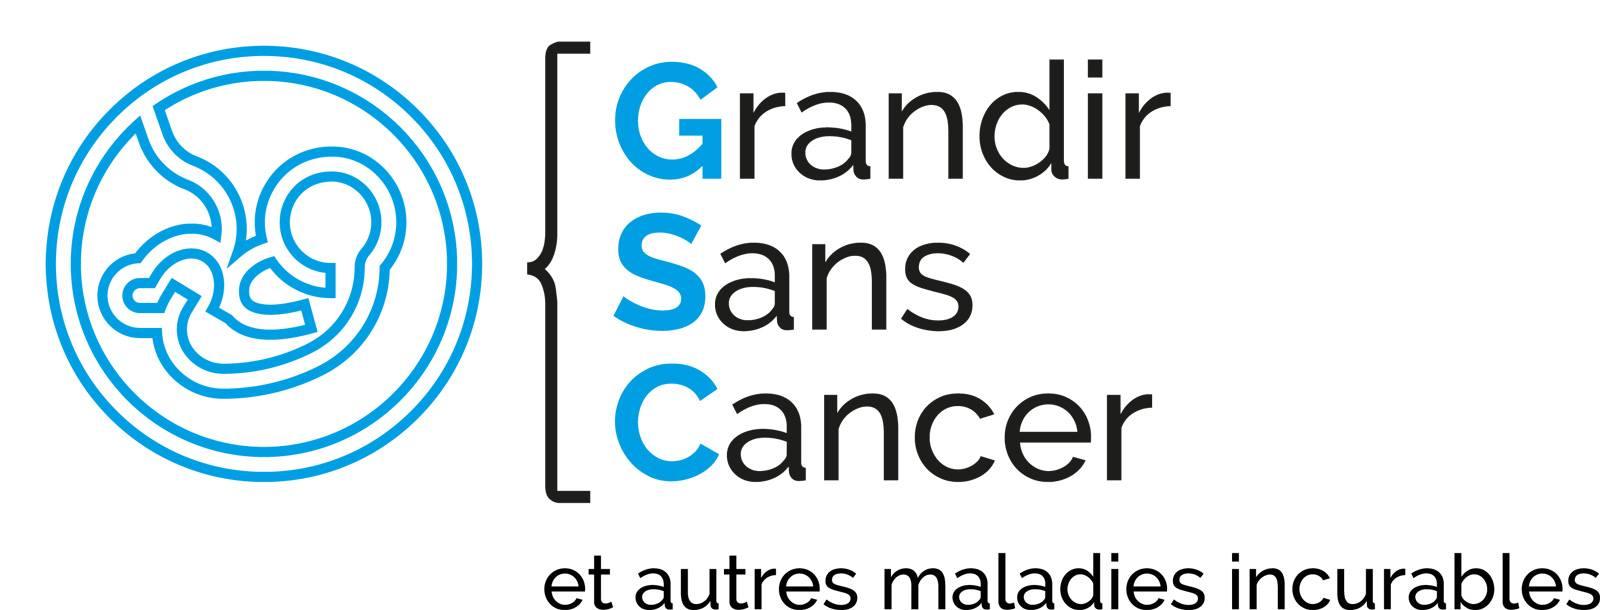 G.S.C ou Grandir Sans Cancer